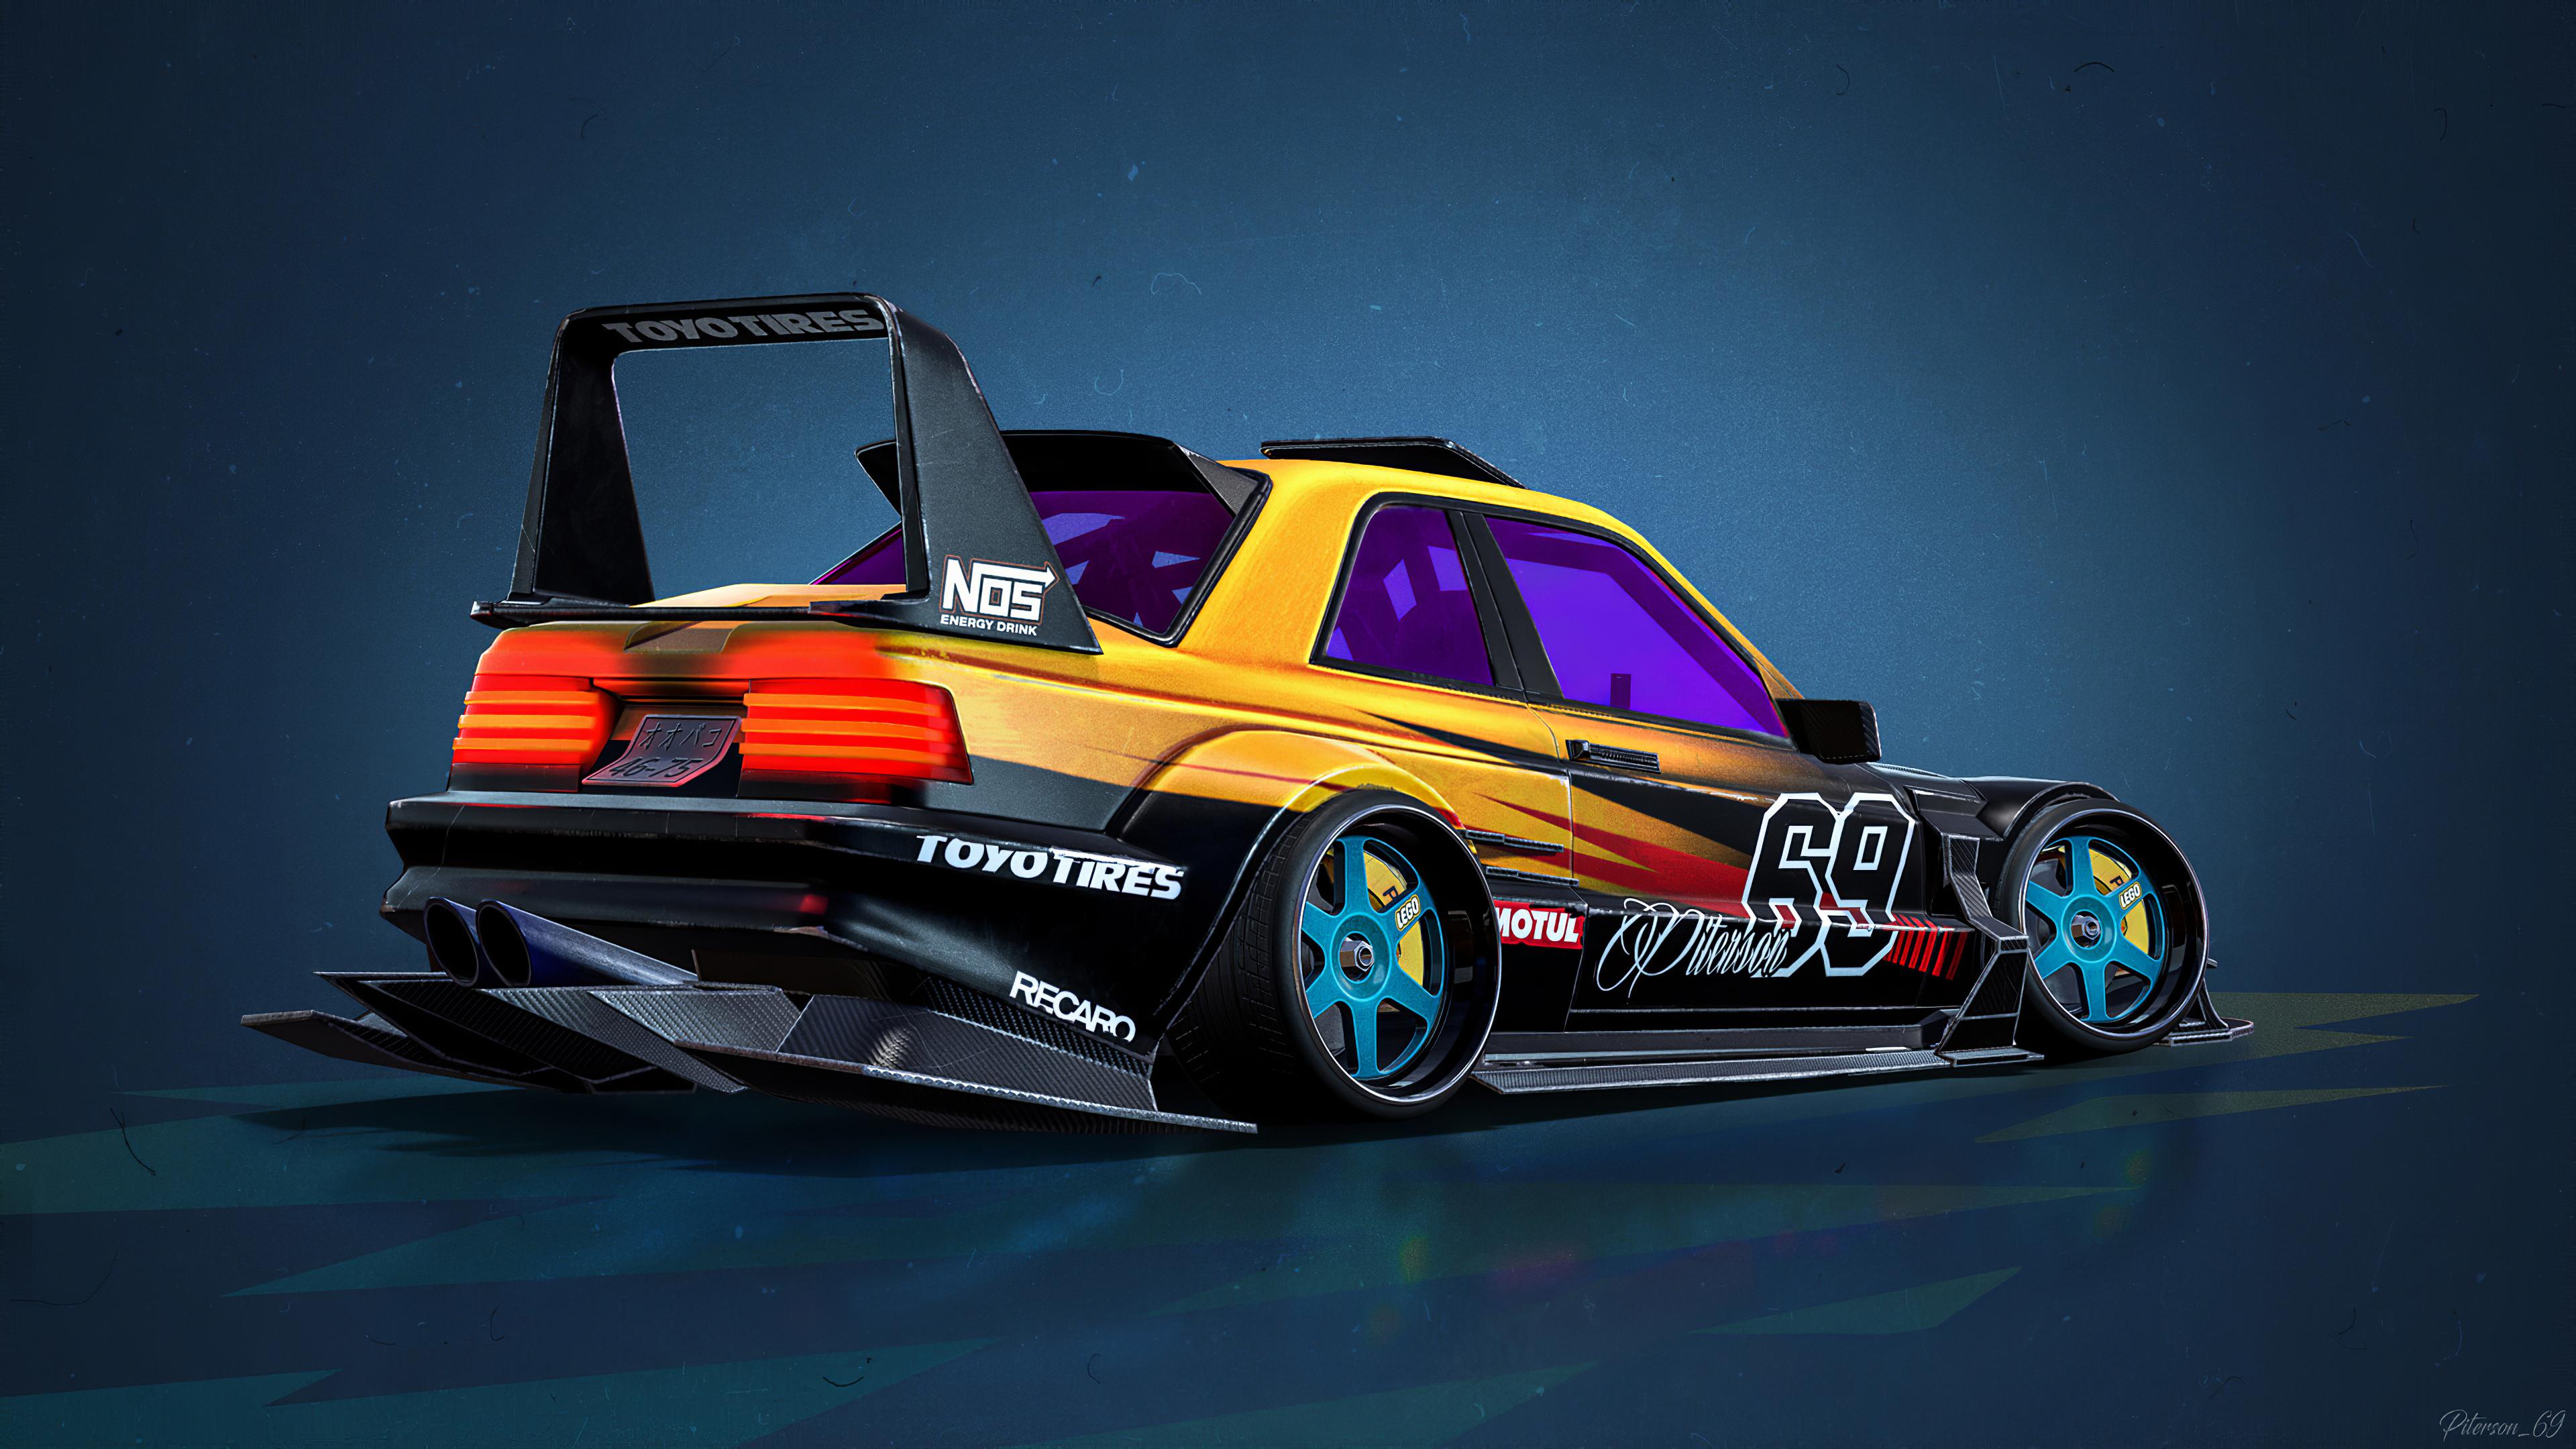 mercedes benz e190 evolution ii 1990 cartoon car 1578255367 - Mercedes Benz E190 Evolution II 1990 Cartoon Car -